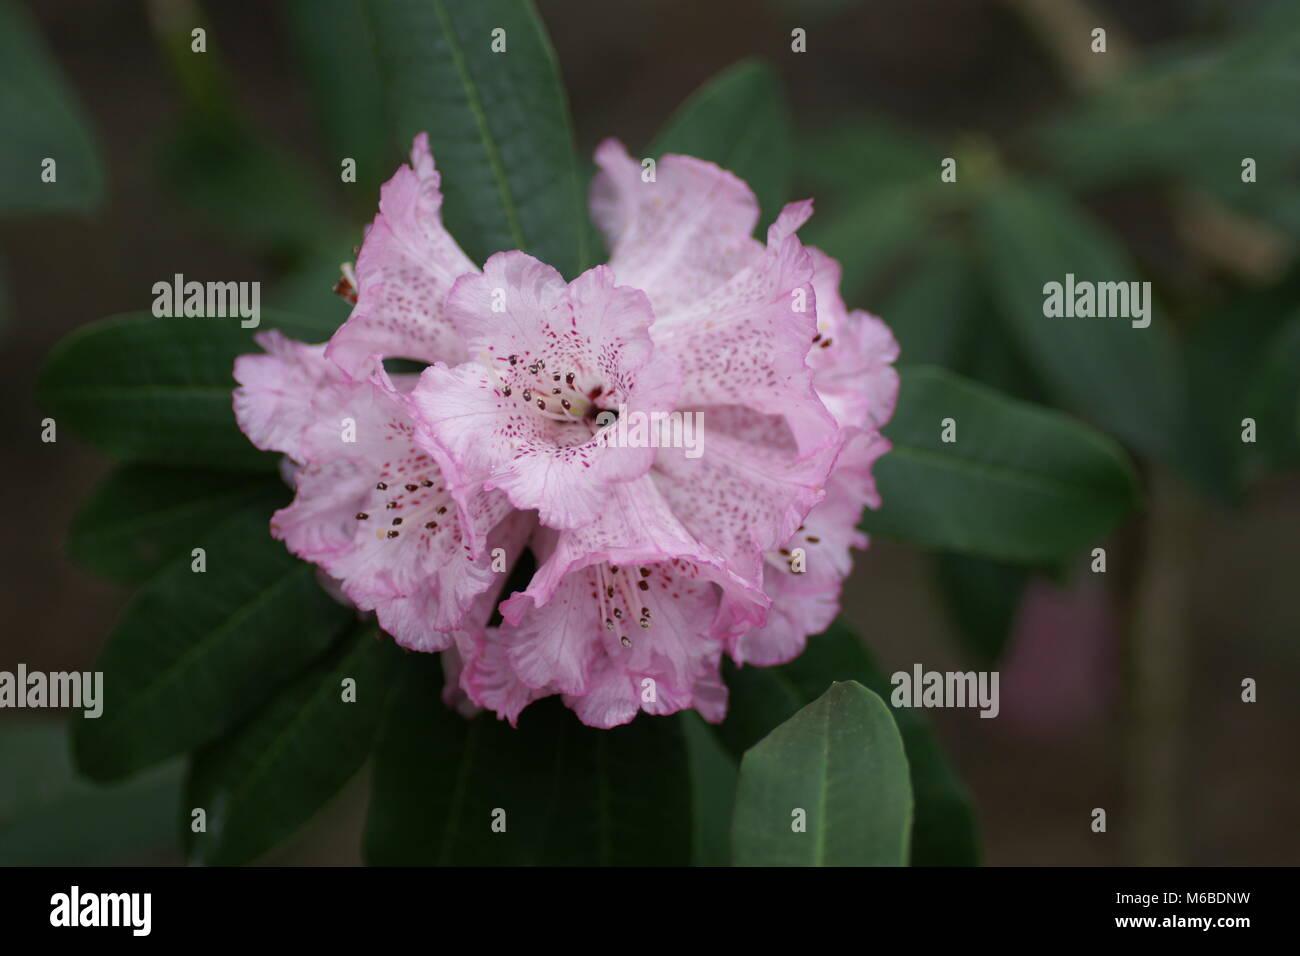 Rhododendron arboreum hybrid - Stock Image